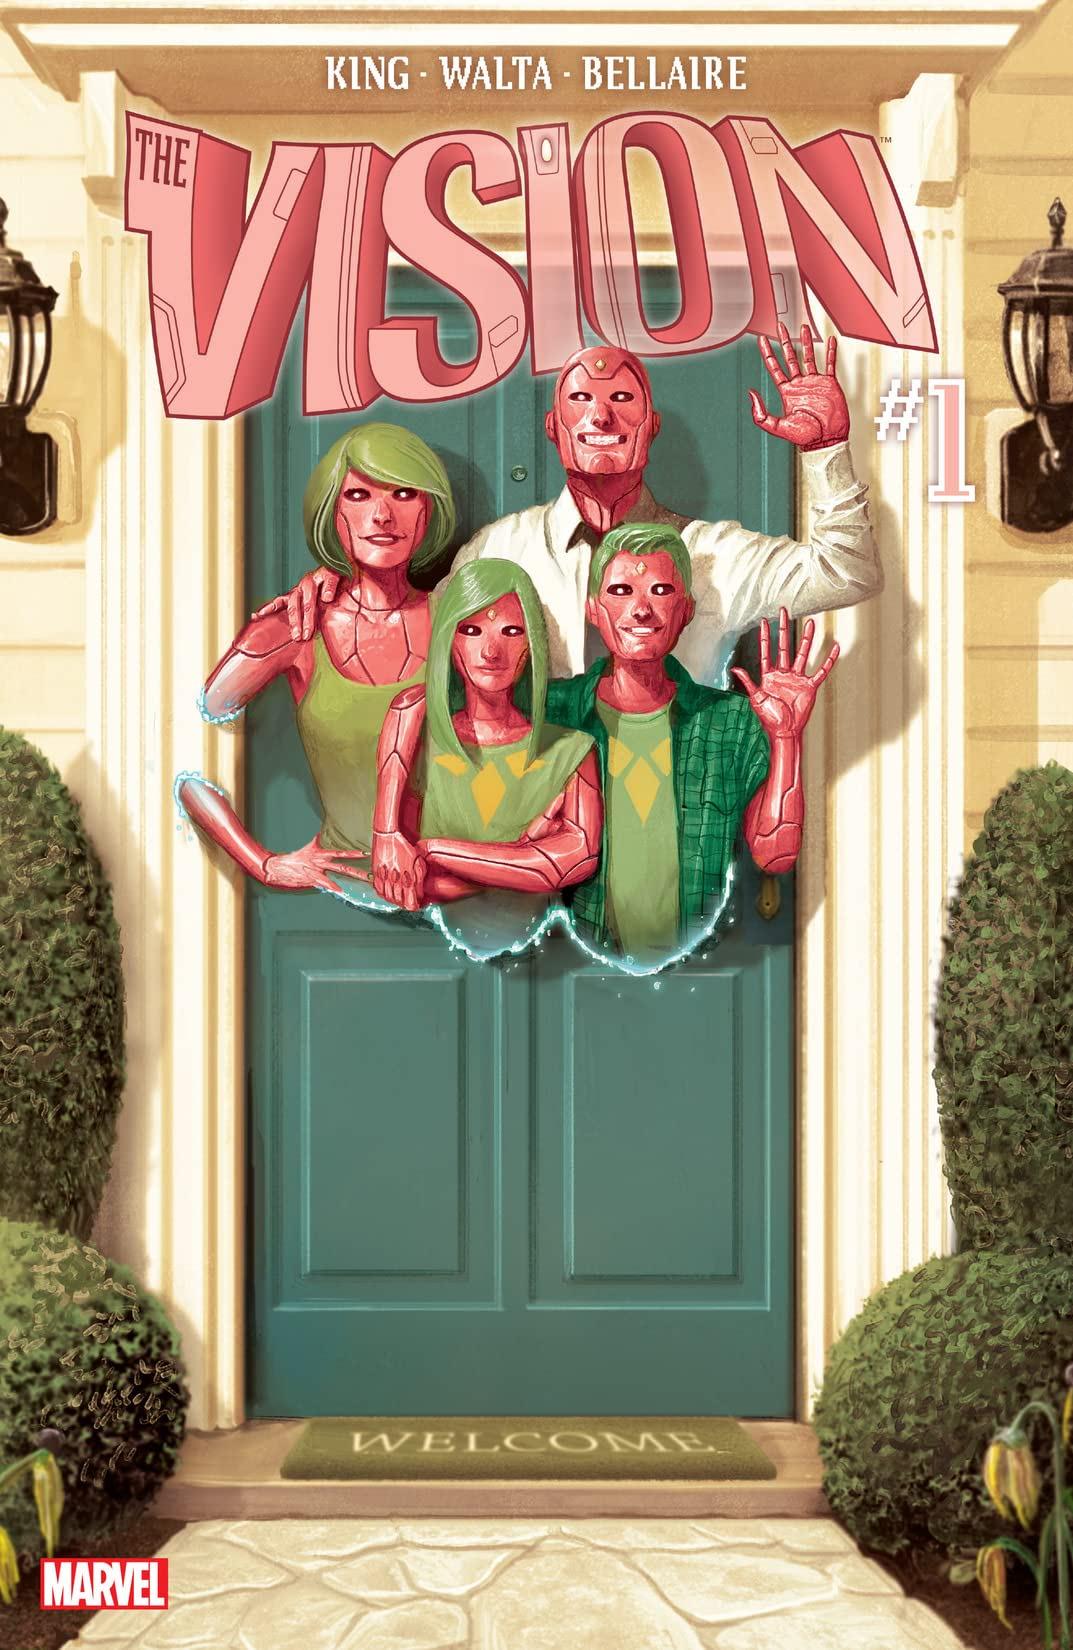 #2 Vision